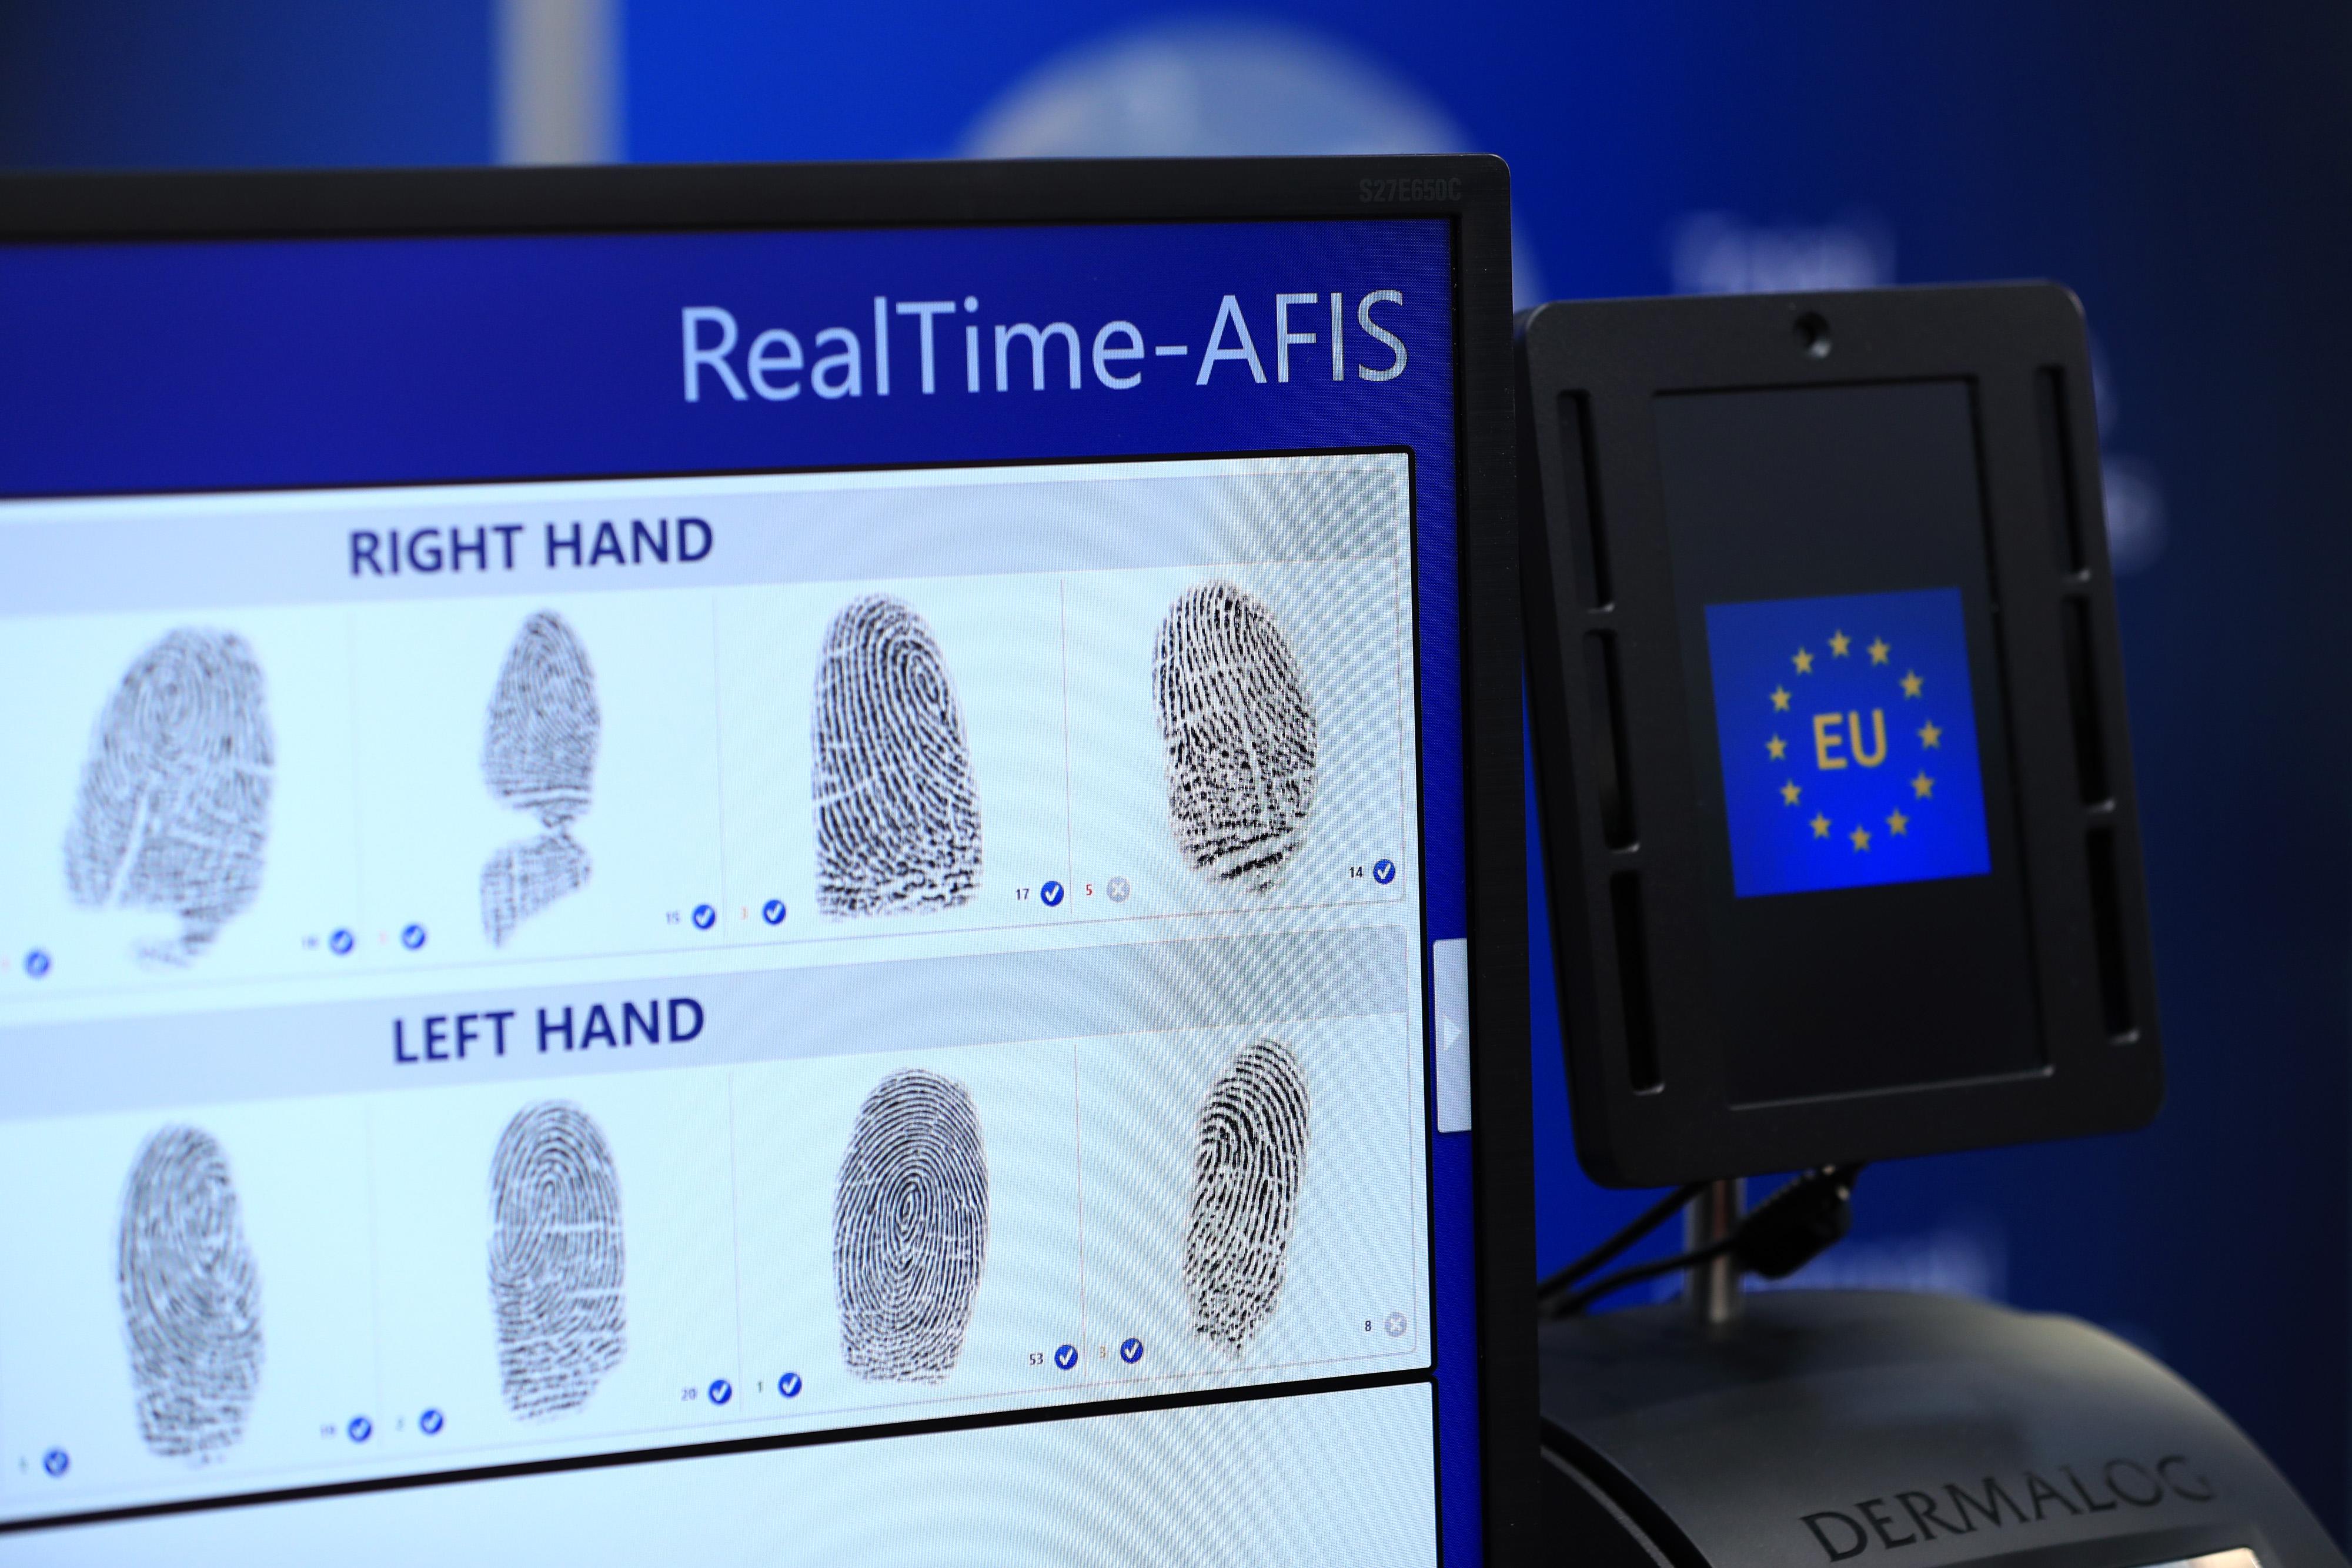 https://assets.sourcemedia.com/e1/0d/29cf0e21409e9808dfc95e2d391c/biometricsfingerbl.jpg